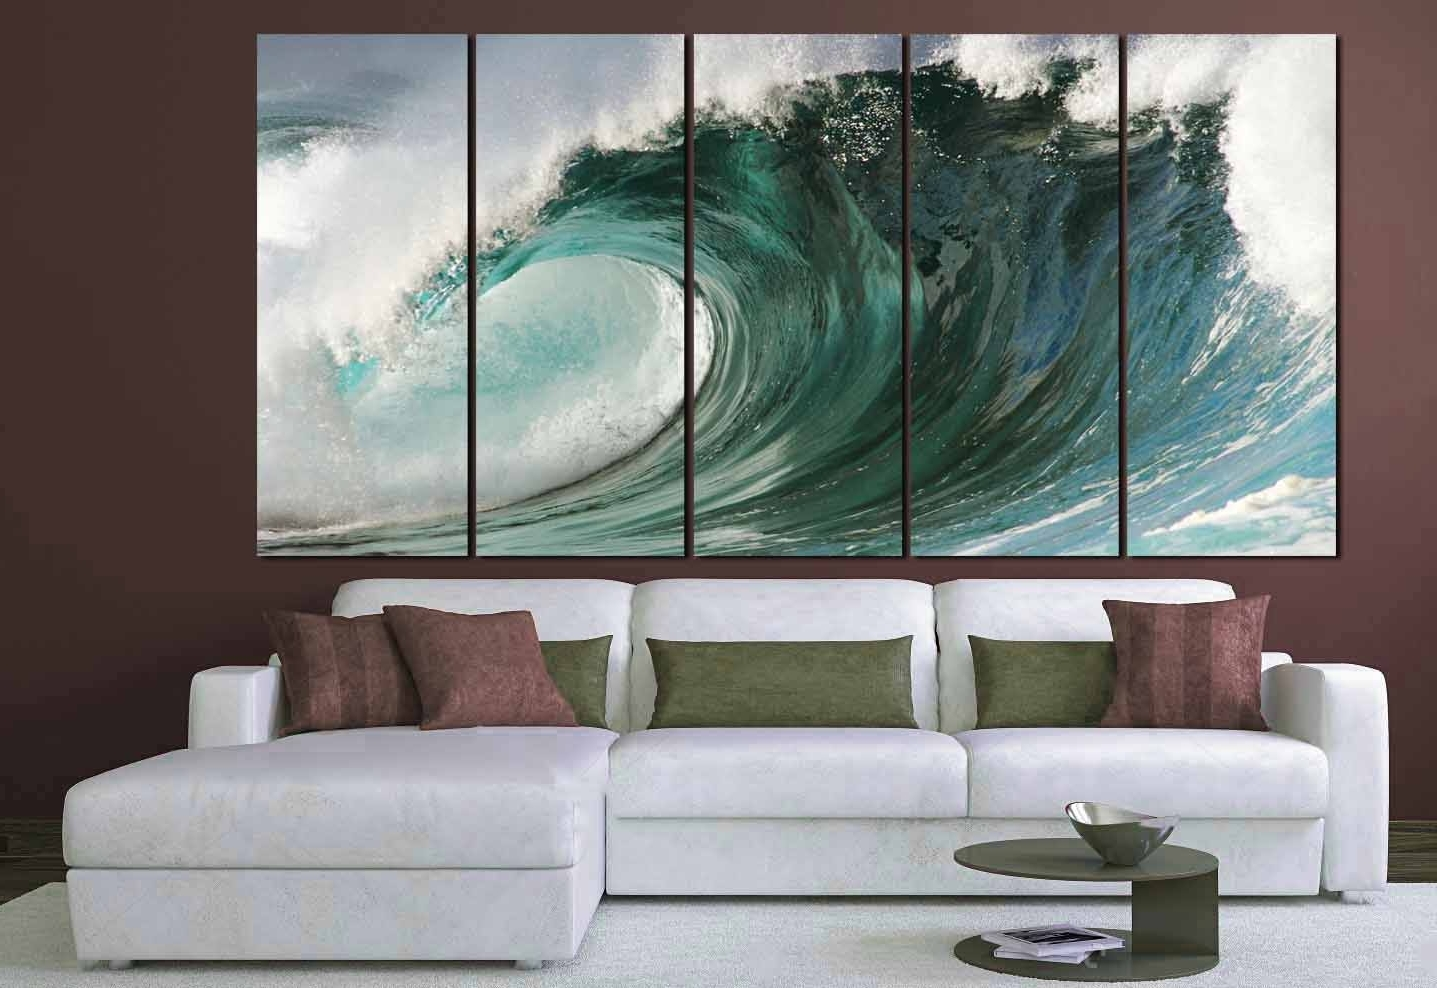 Ocean Wall Art Regarding 2017 Ocean Waves Art,large Ocean Wall Art, Ocean Waves Canvas Art,ocean (View 12 of 15)